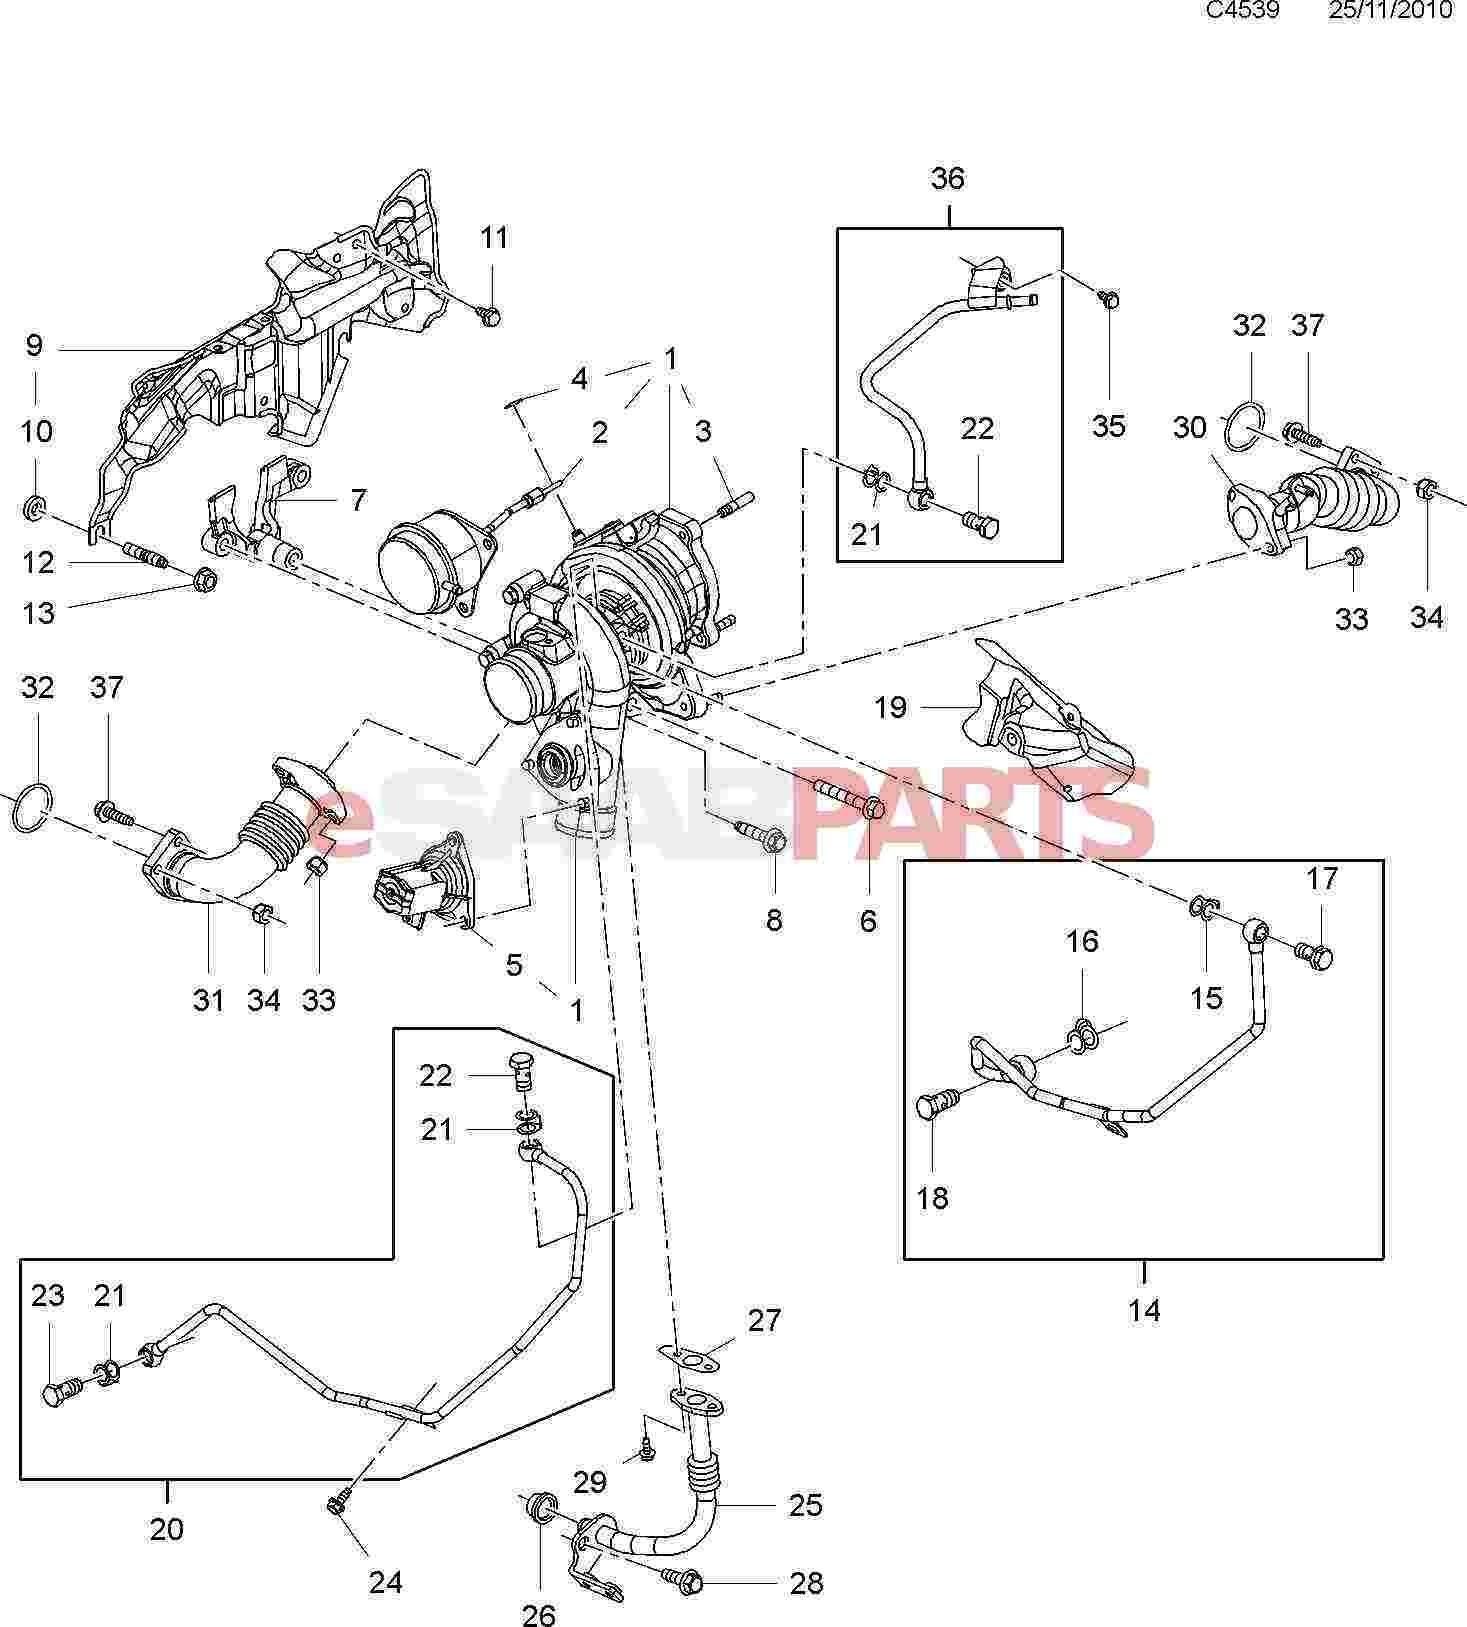 081 2001 Saab 9 5 Wiring Diagram Wiring Library